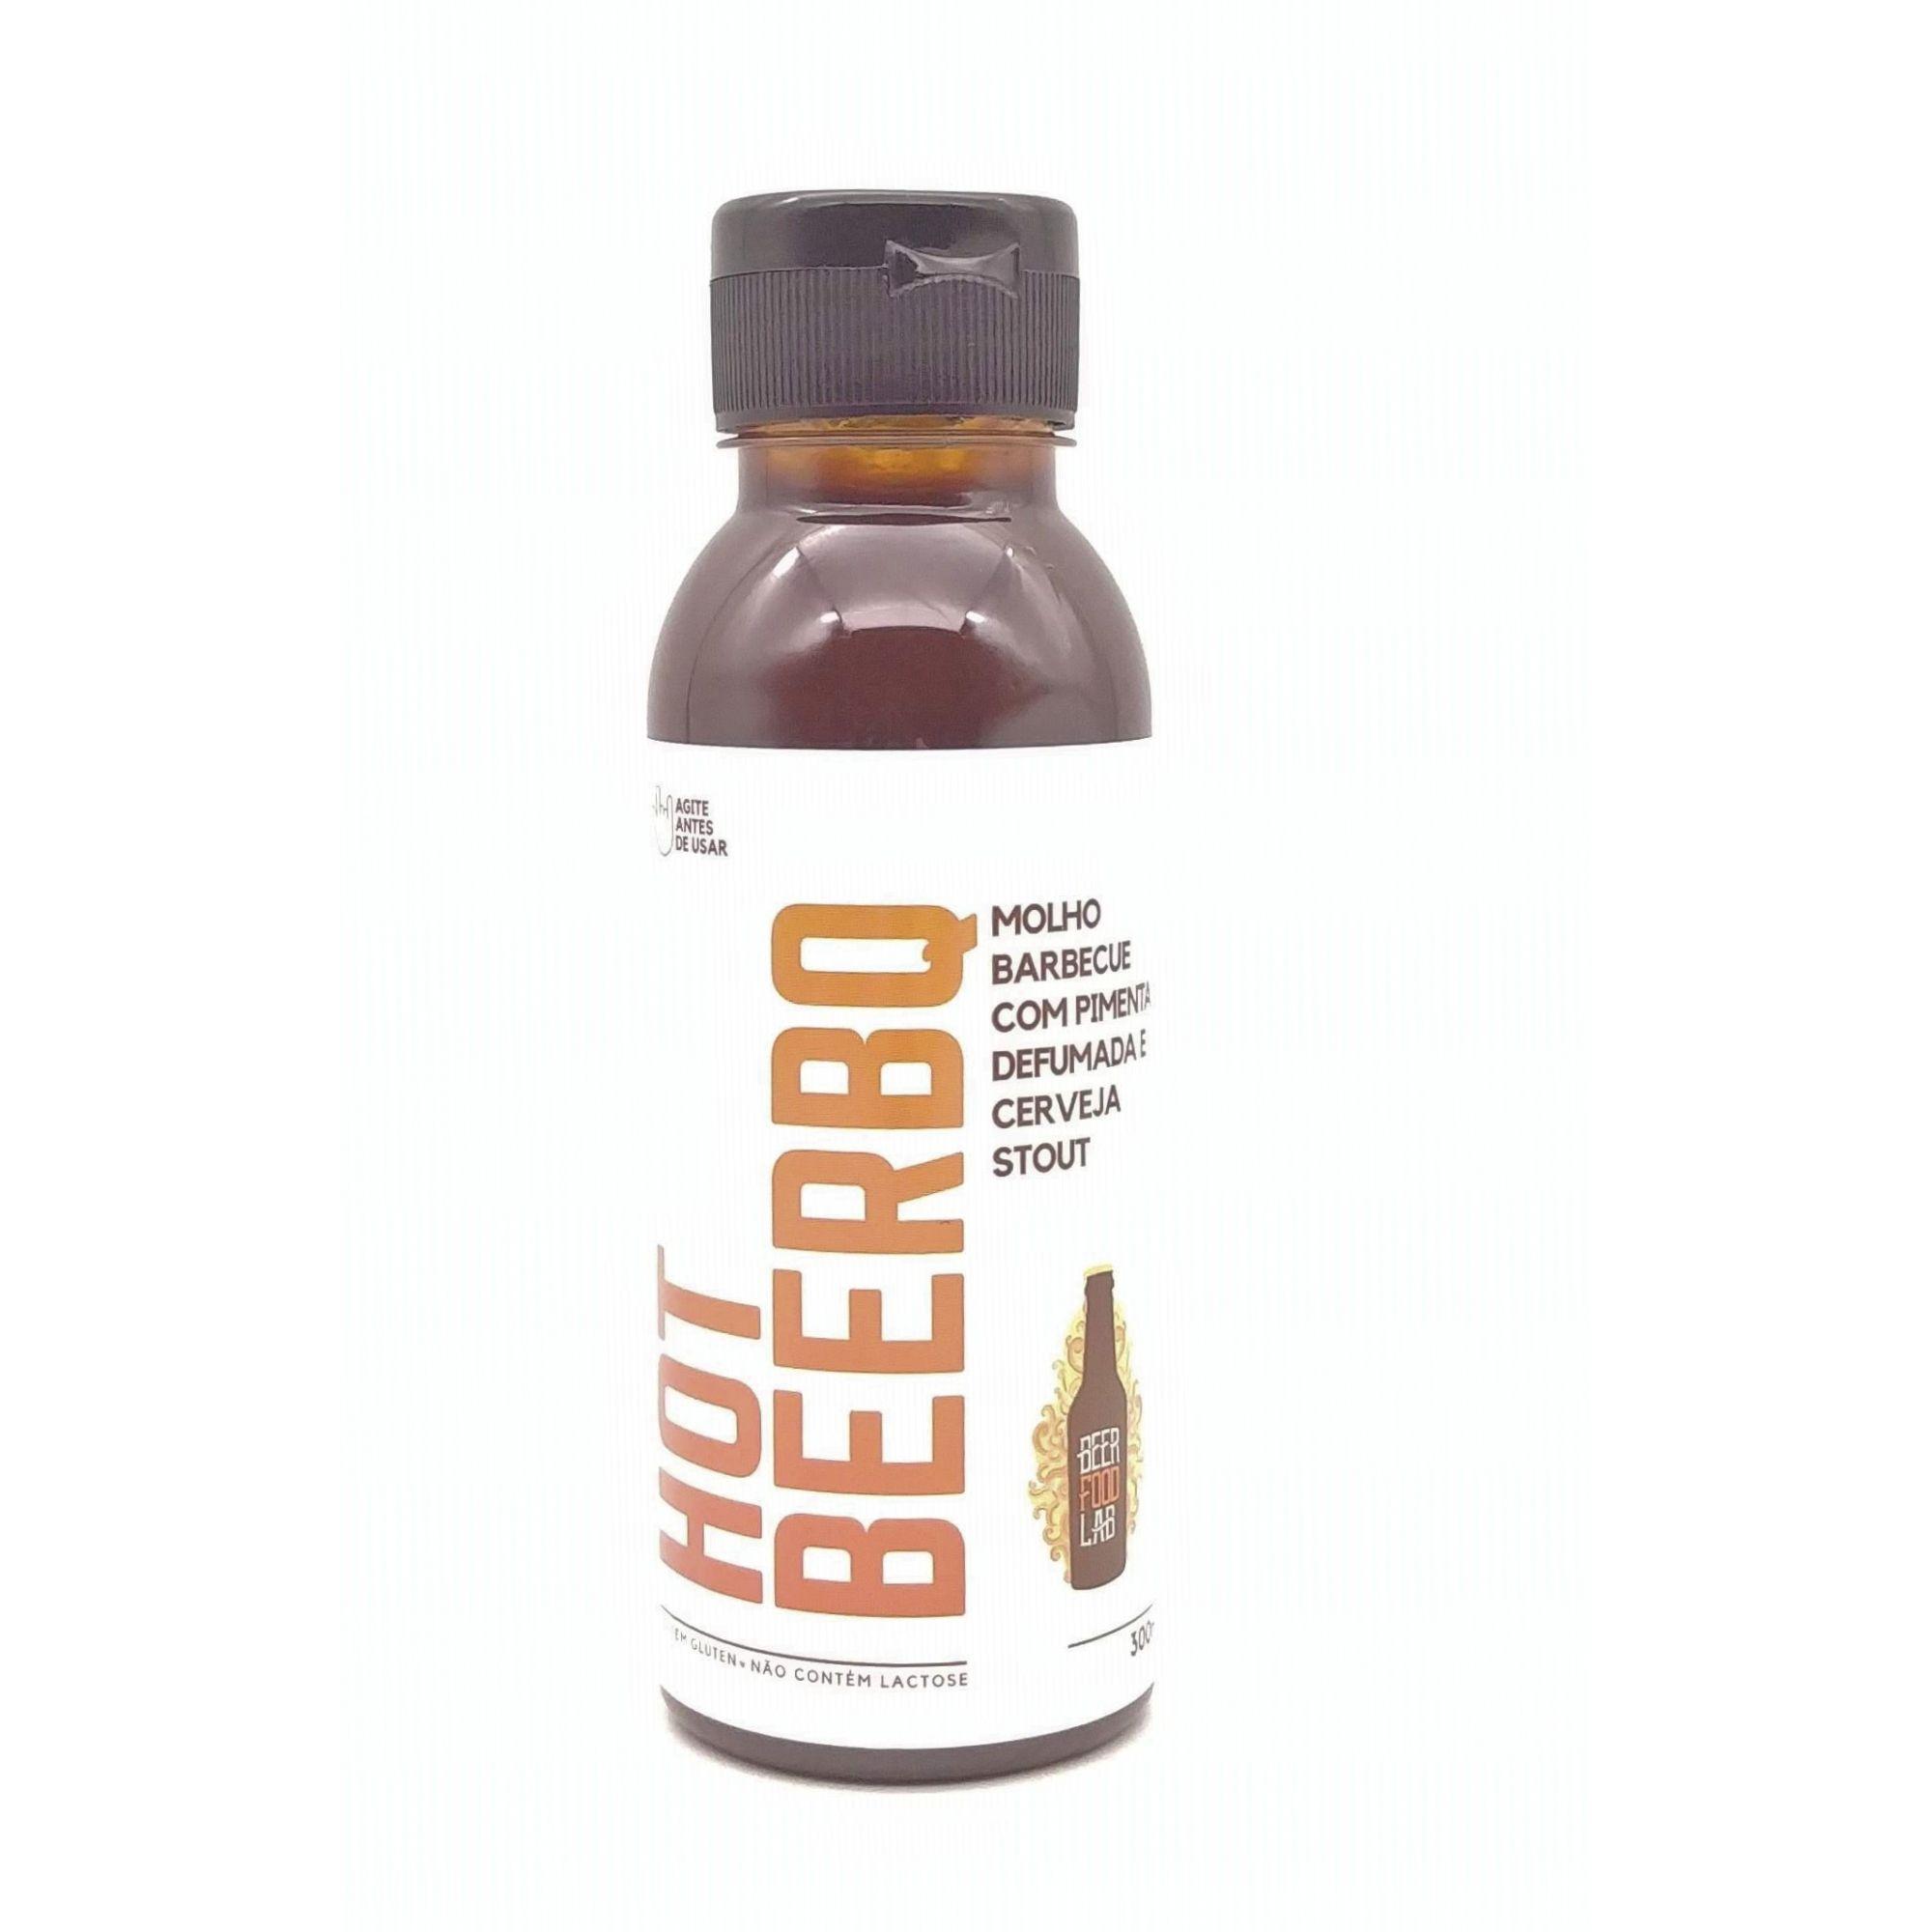 HOT BEERBQ - Molho Barbecue com Pimenta Defumada e Cerveja Stout